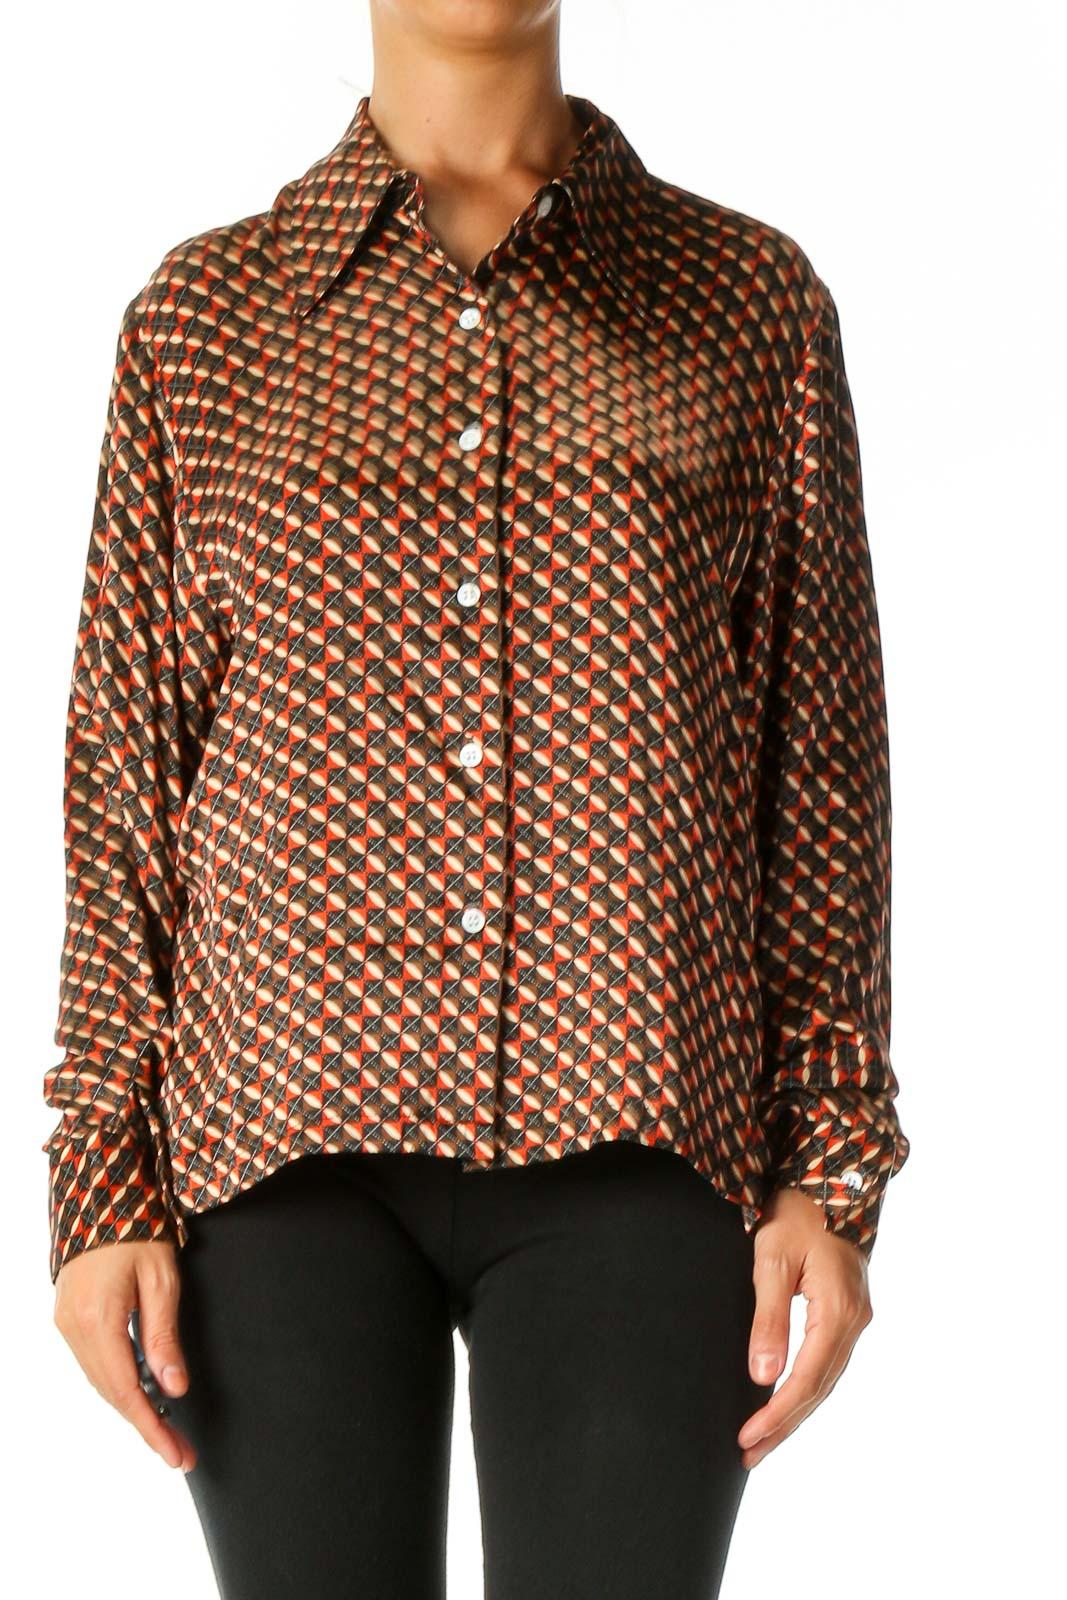 Brown Geometric Print Work Shirt Front